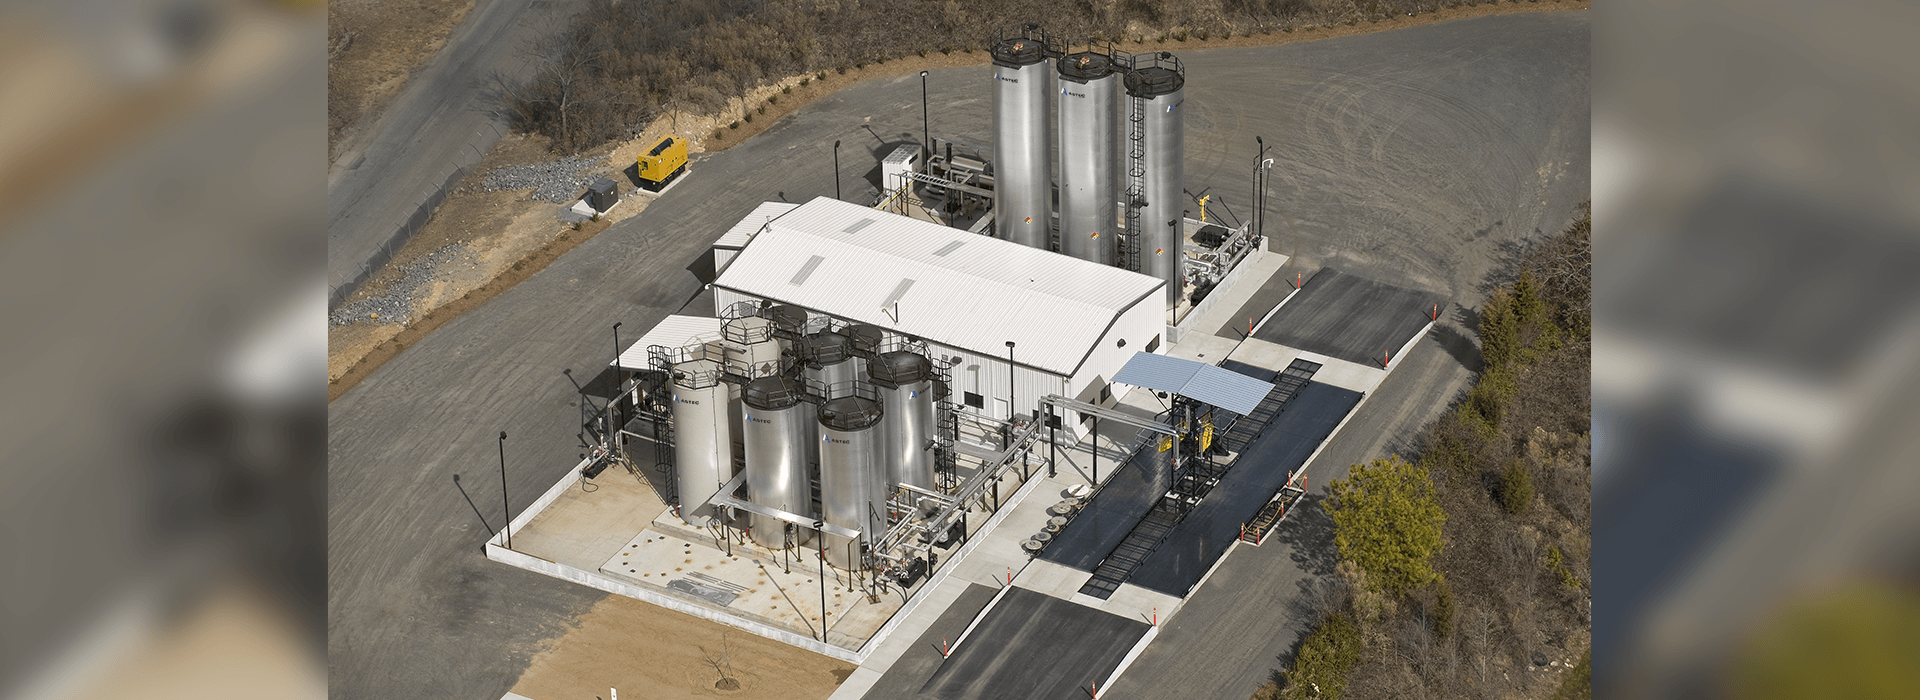 Heatec Asphalt Emulsion Plant